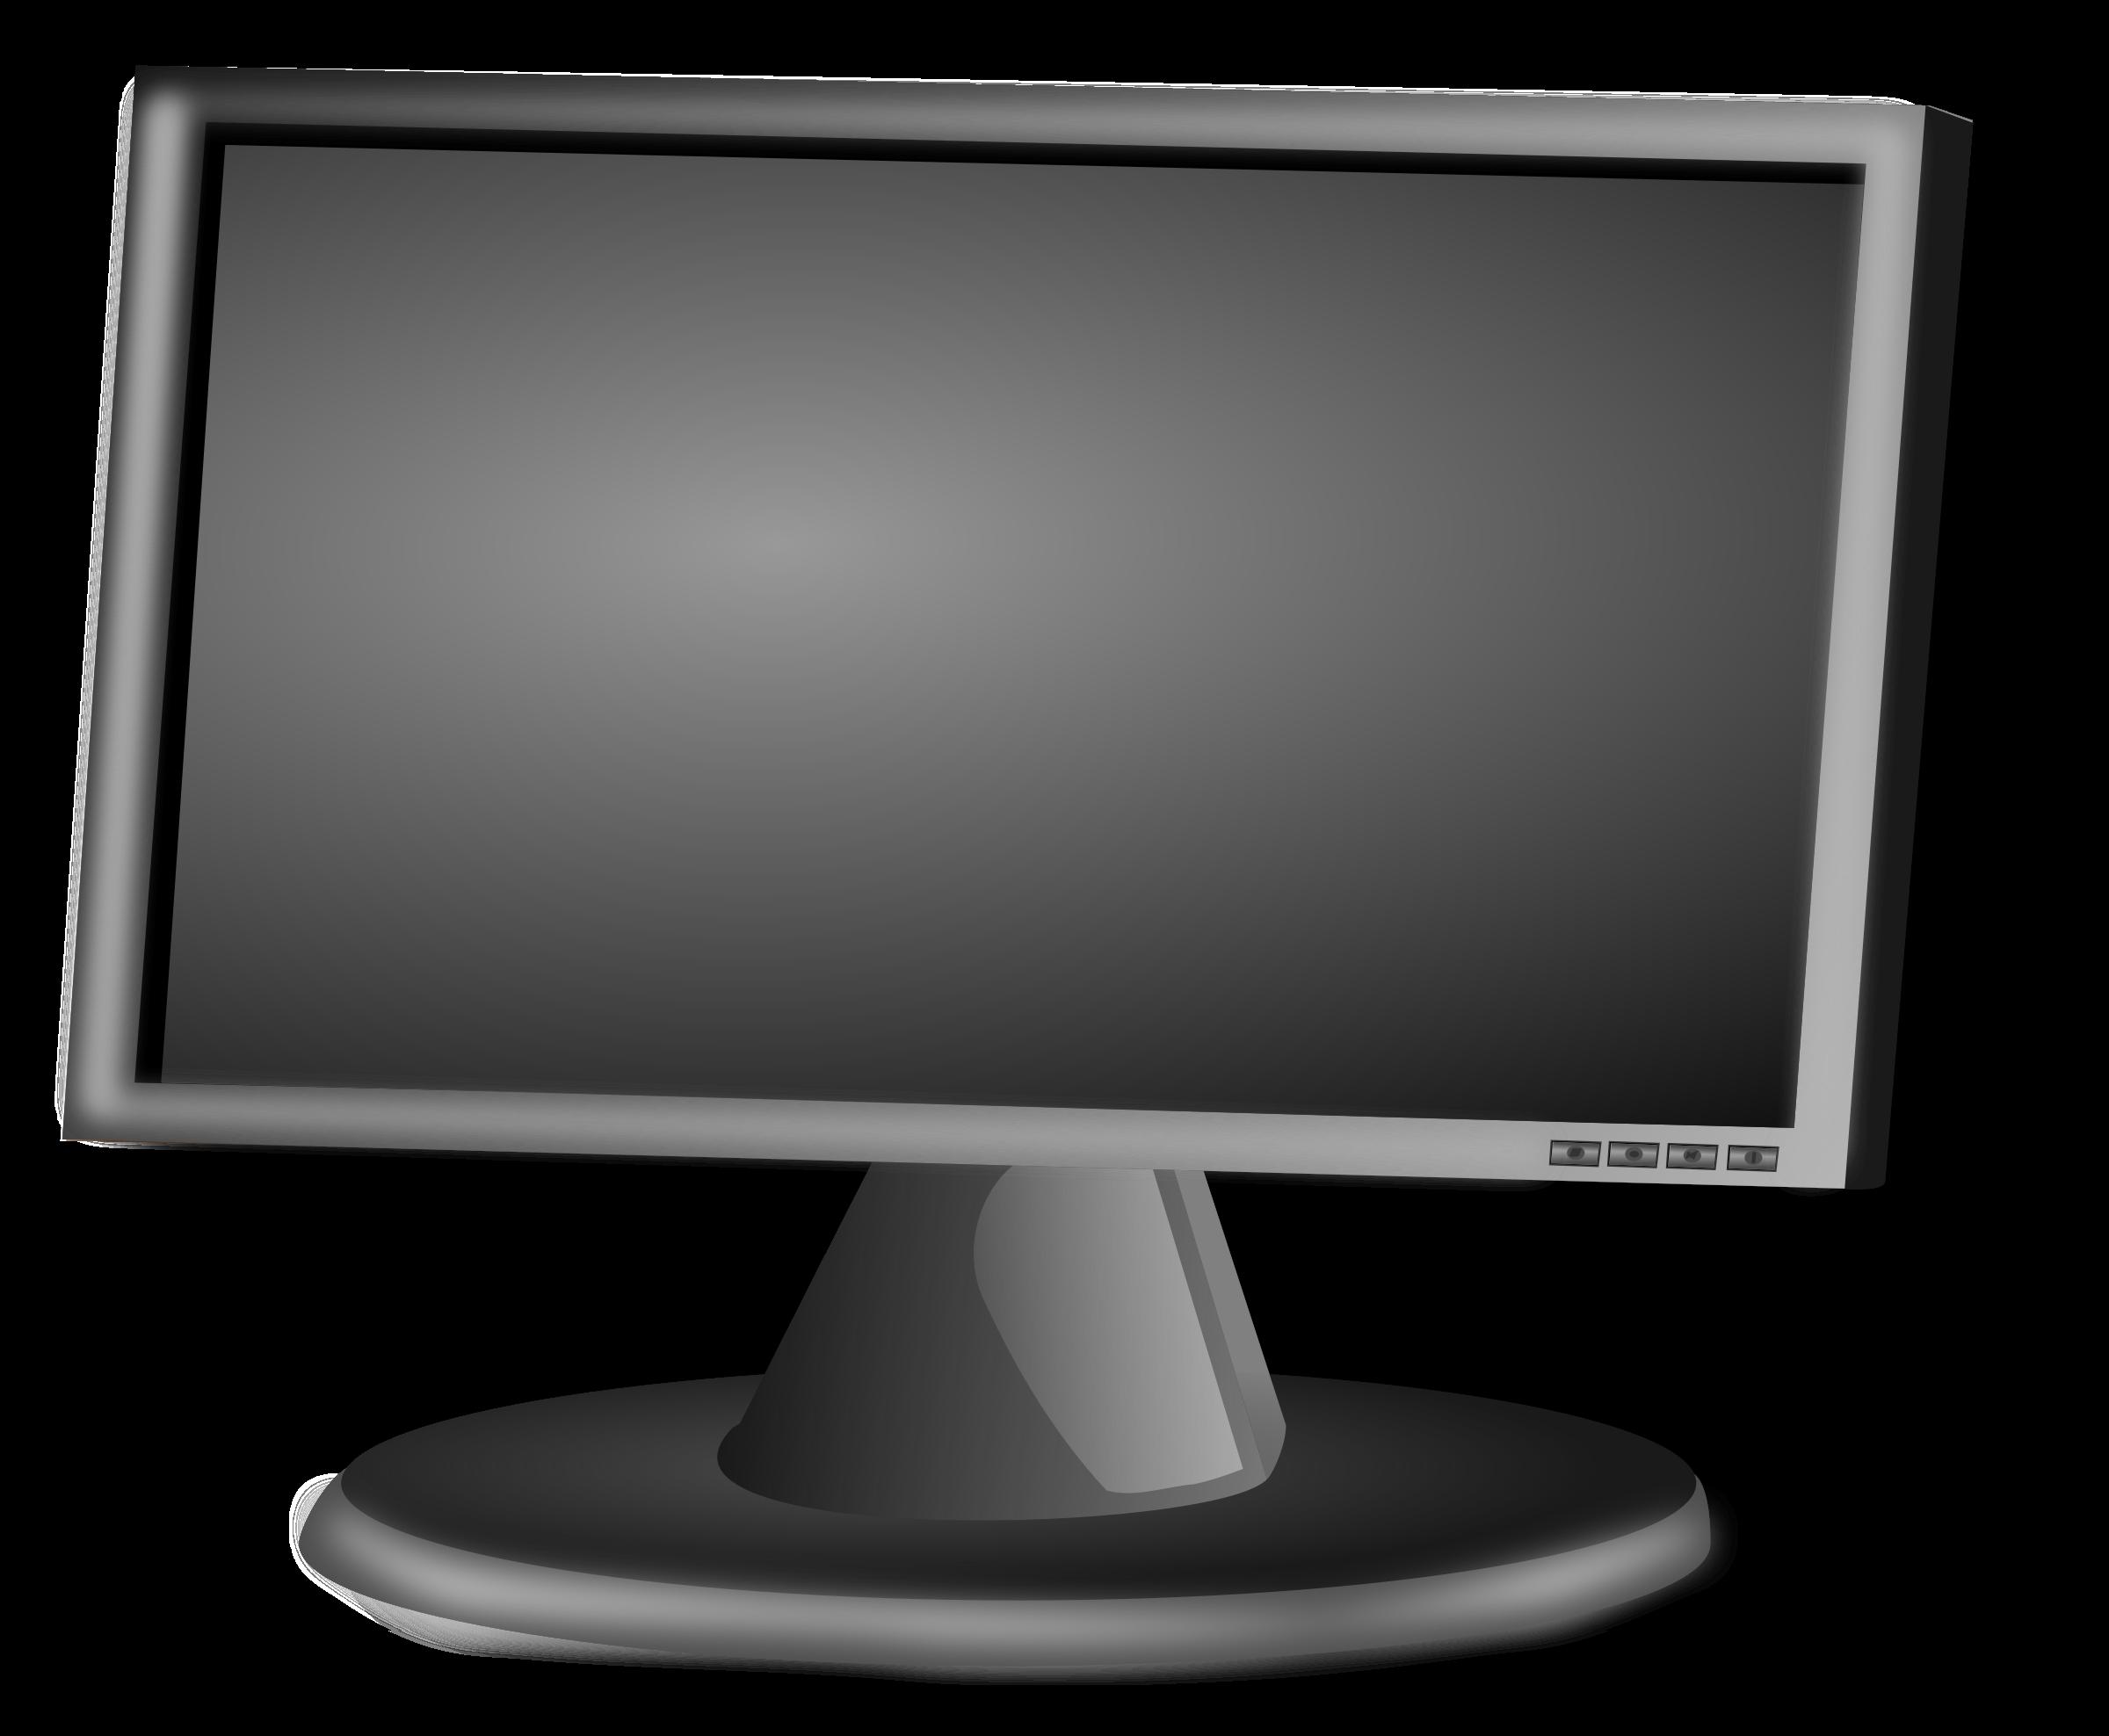 2400 x 1976 png 499kBScreen